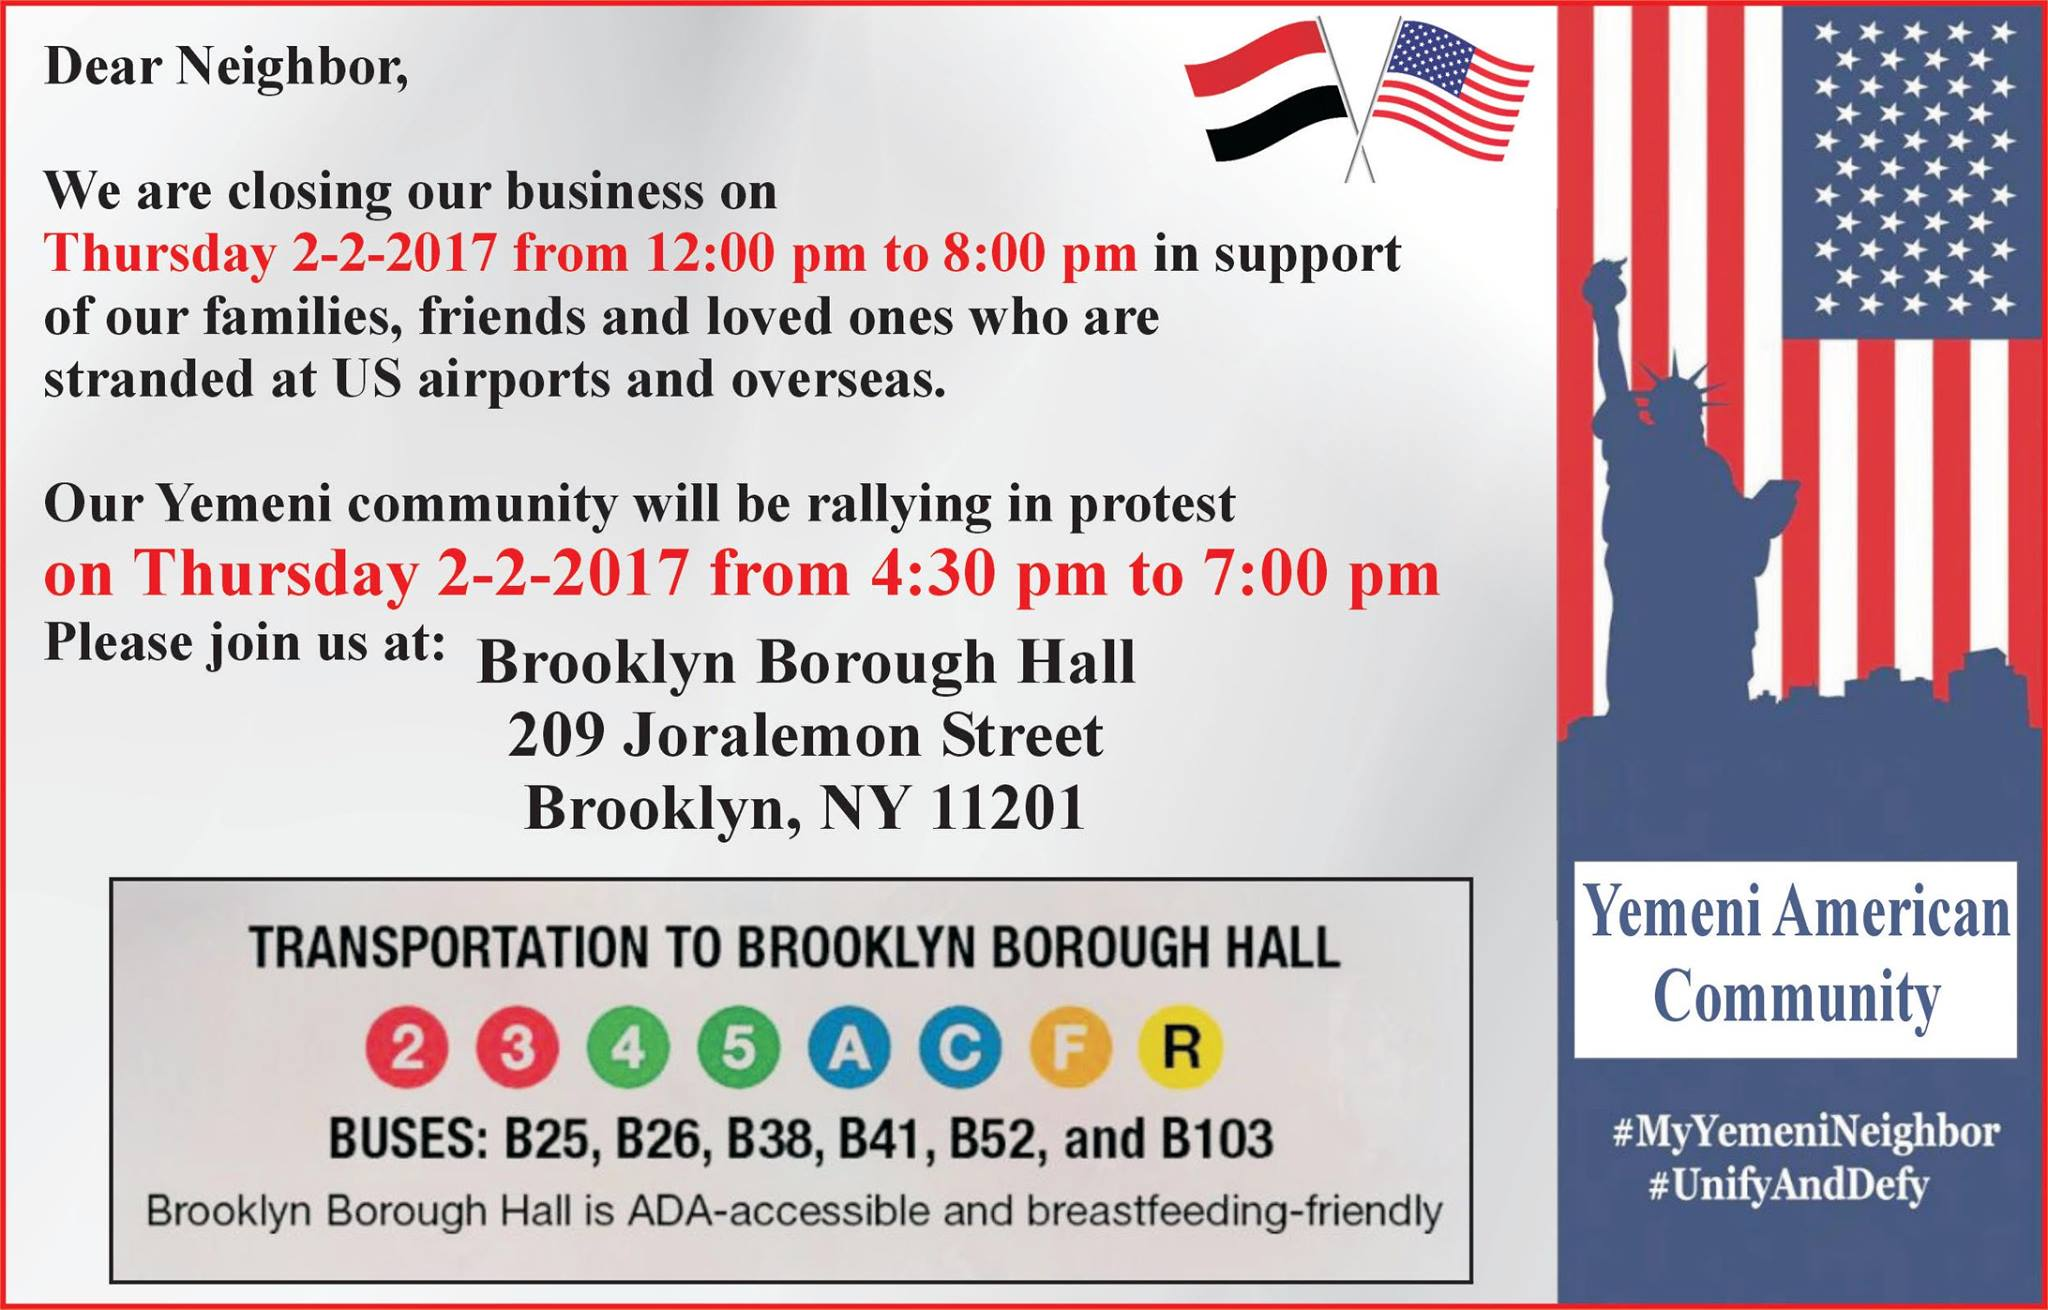 Yemeni American Community